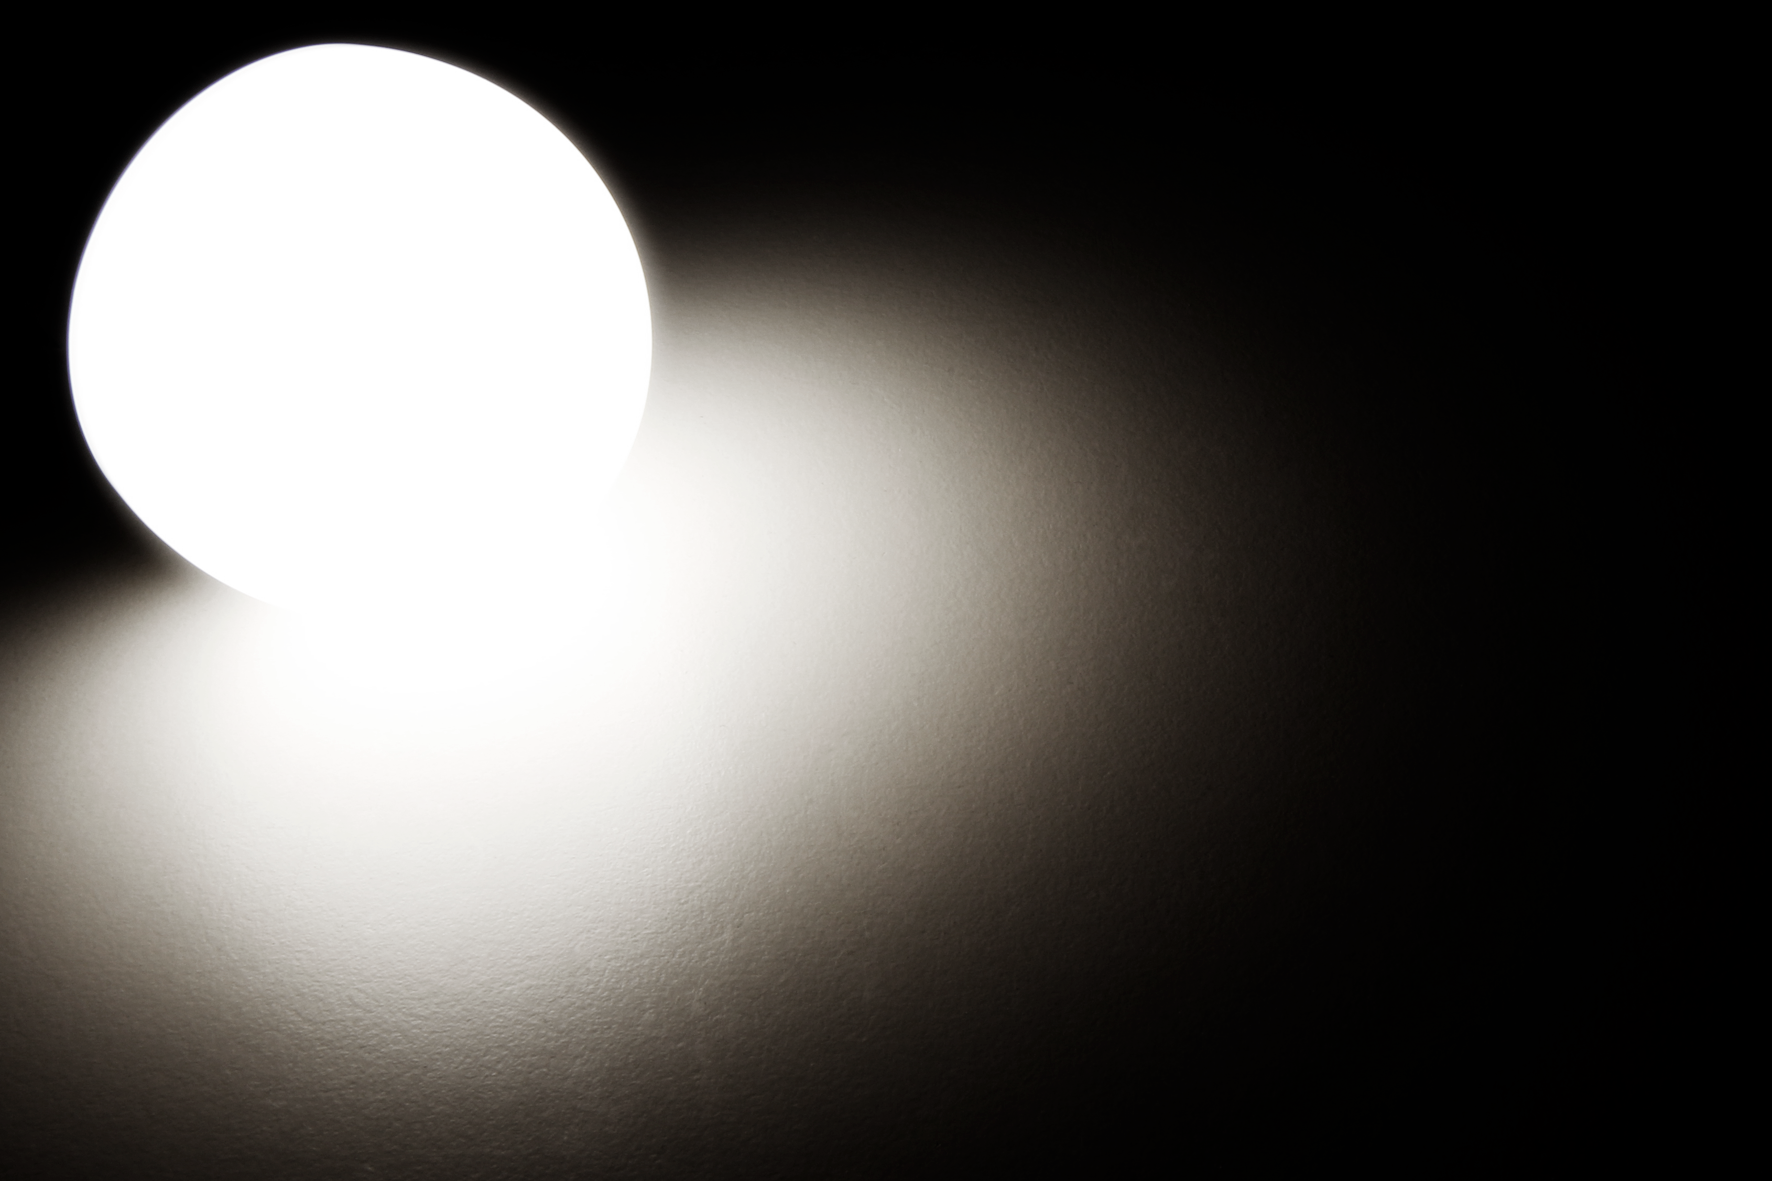 LED Renovierleuchte McShine, 15W, 1.250lm, 220°, 4000K, inkl. Aufhänger